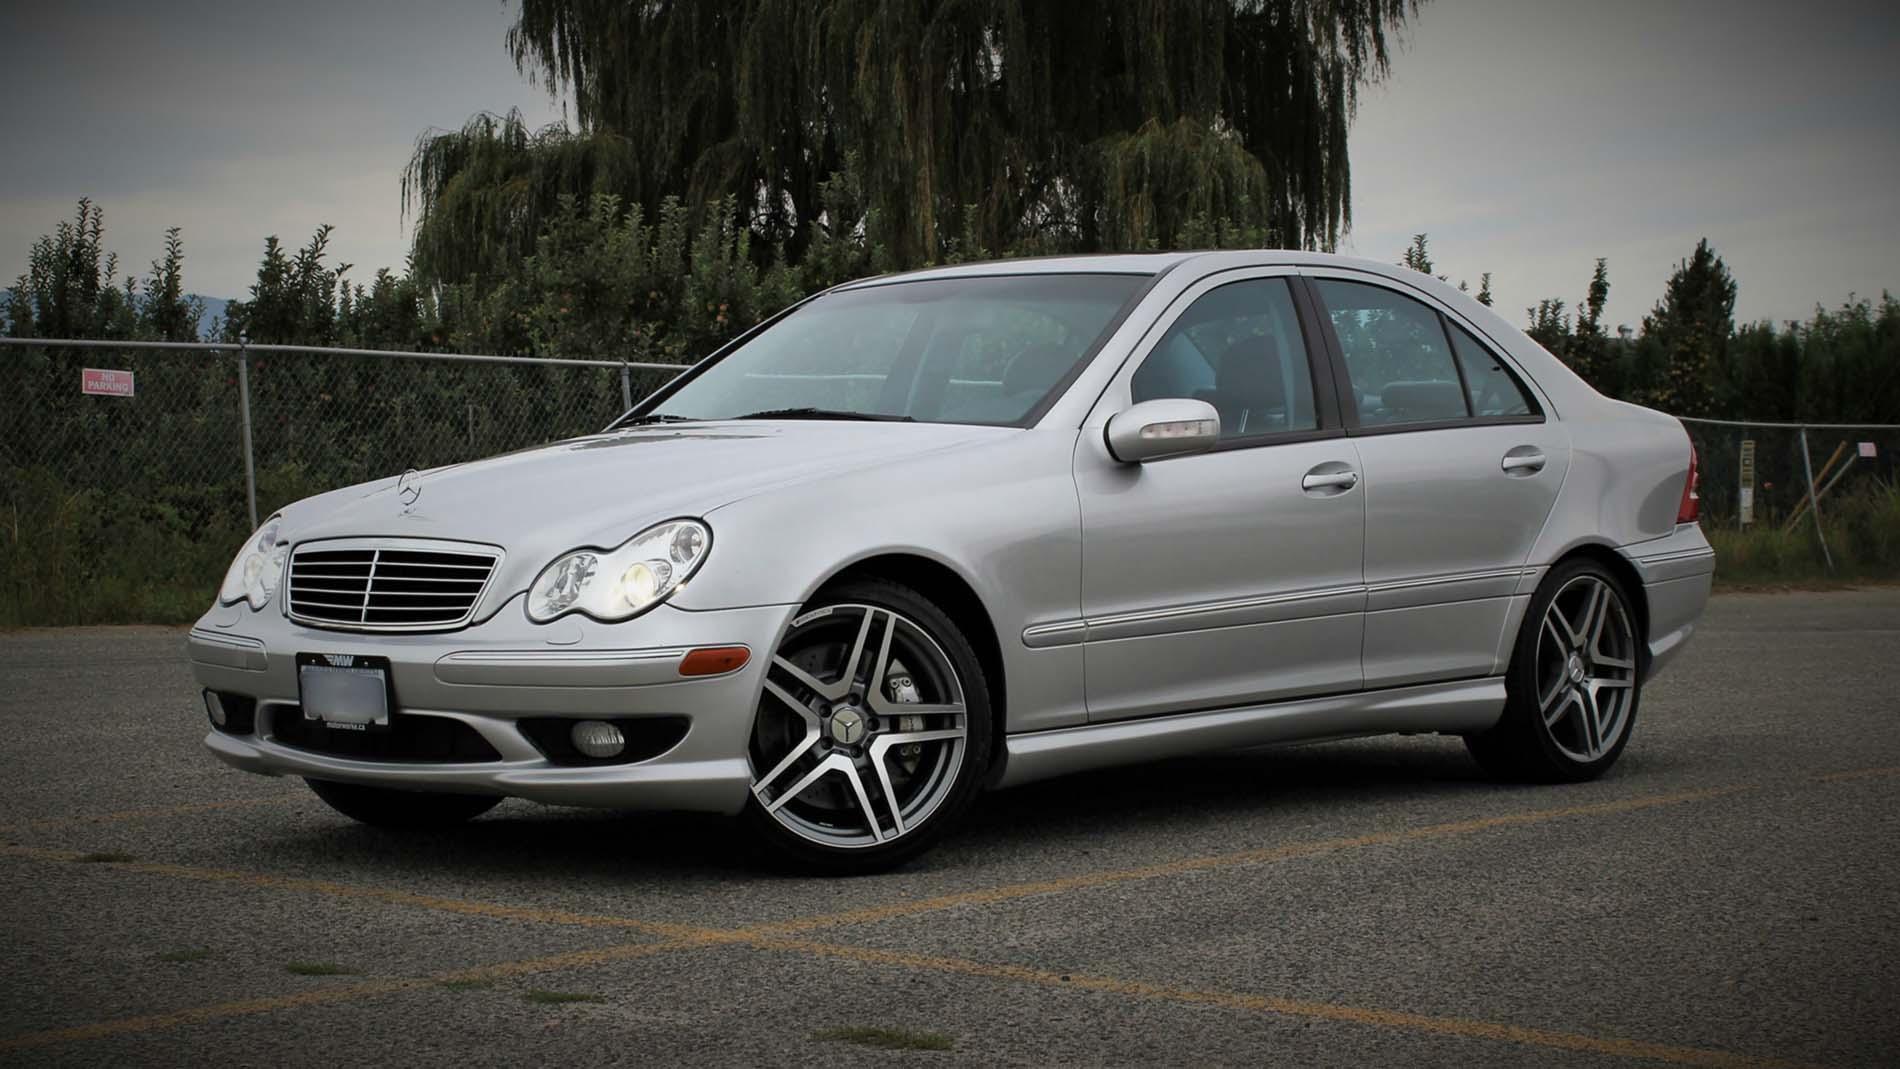 AMG Mercedes Benz in Kelowna